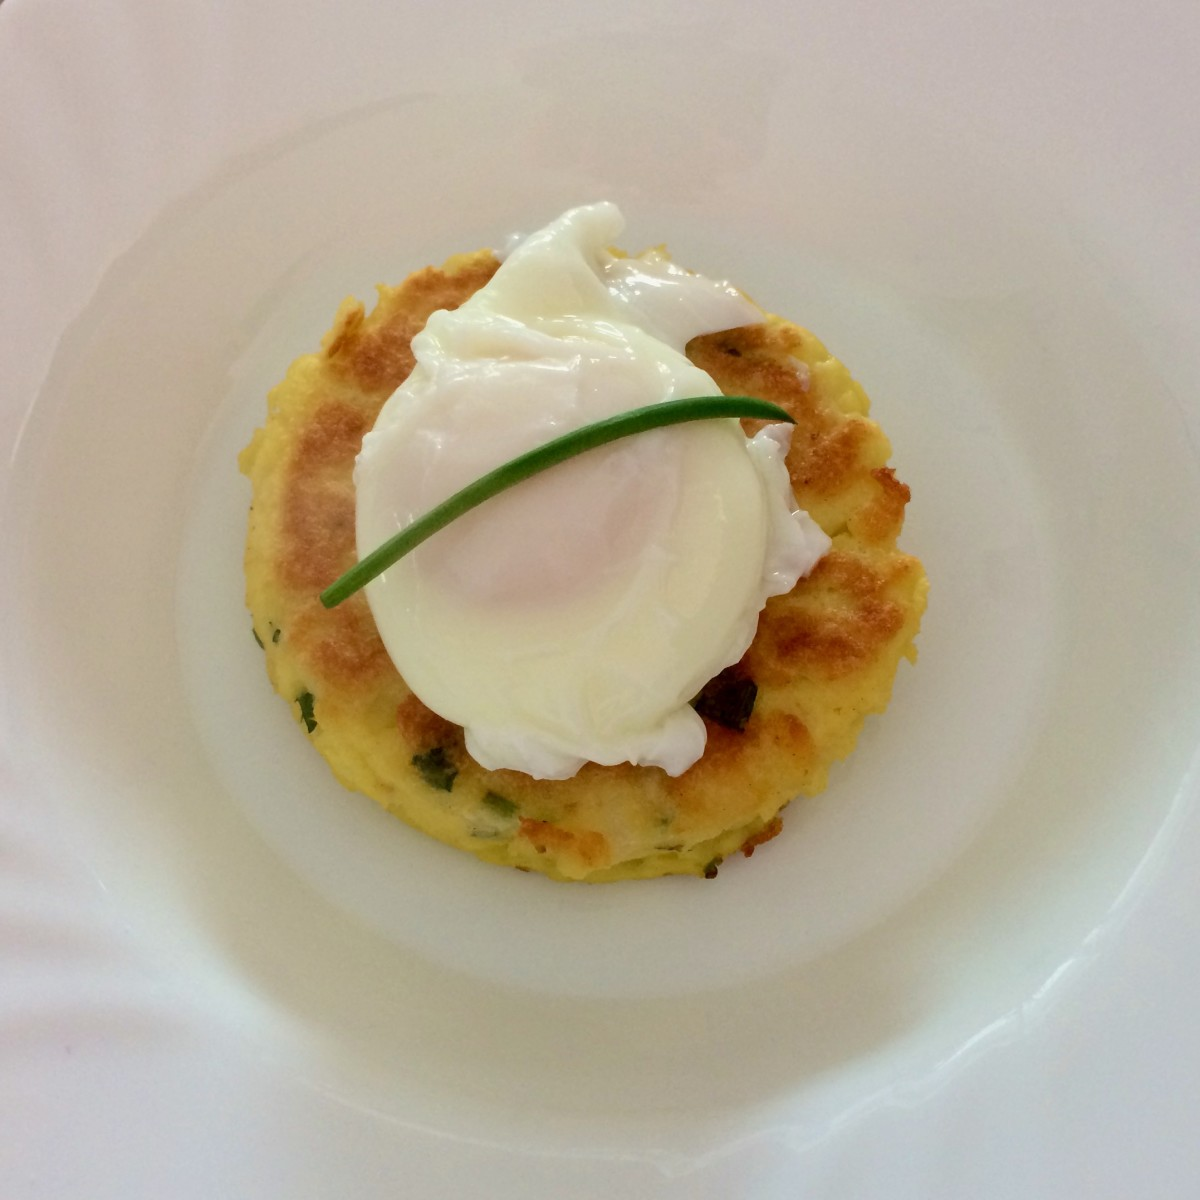 Potato cake with a poached egg